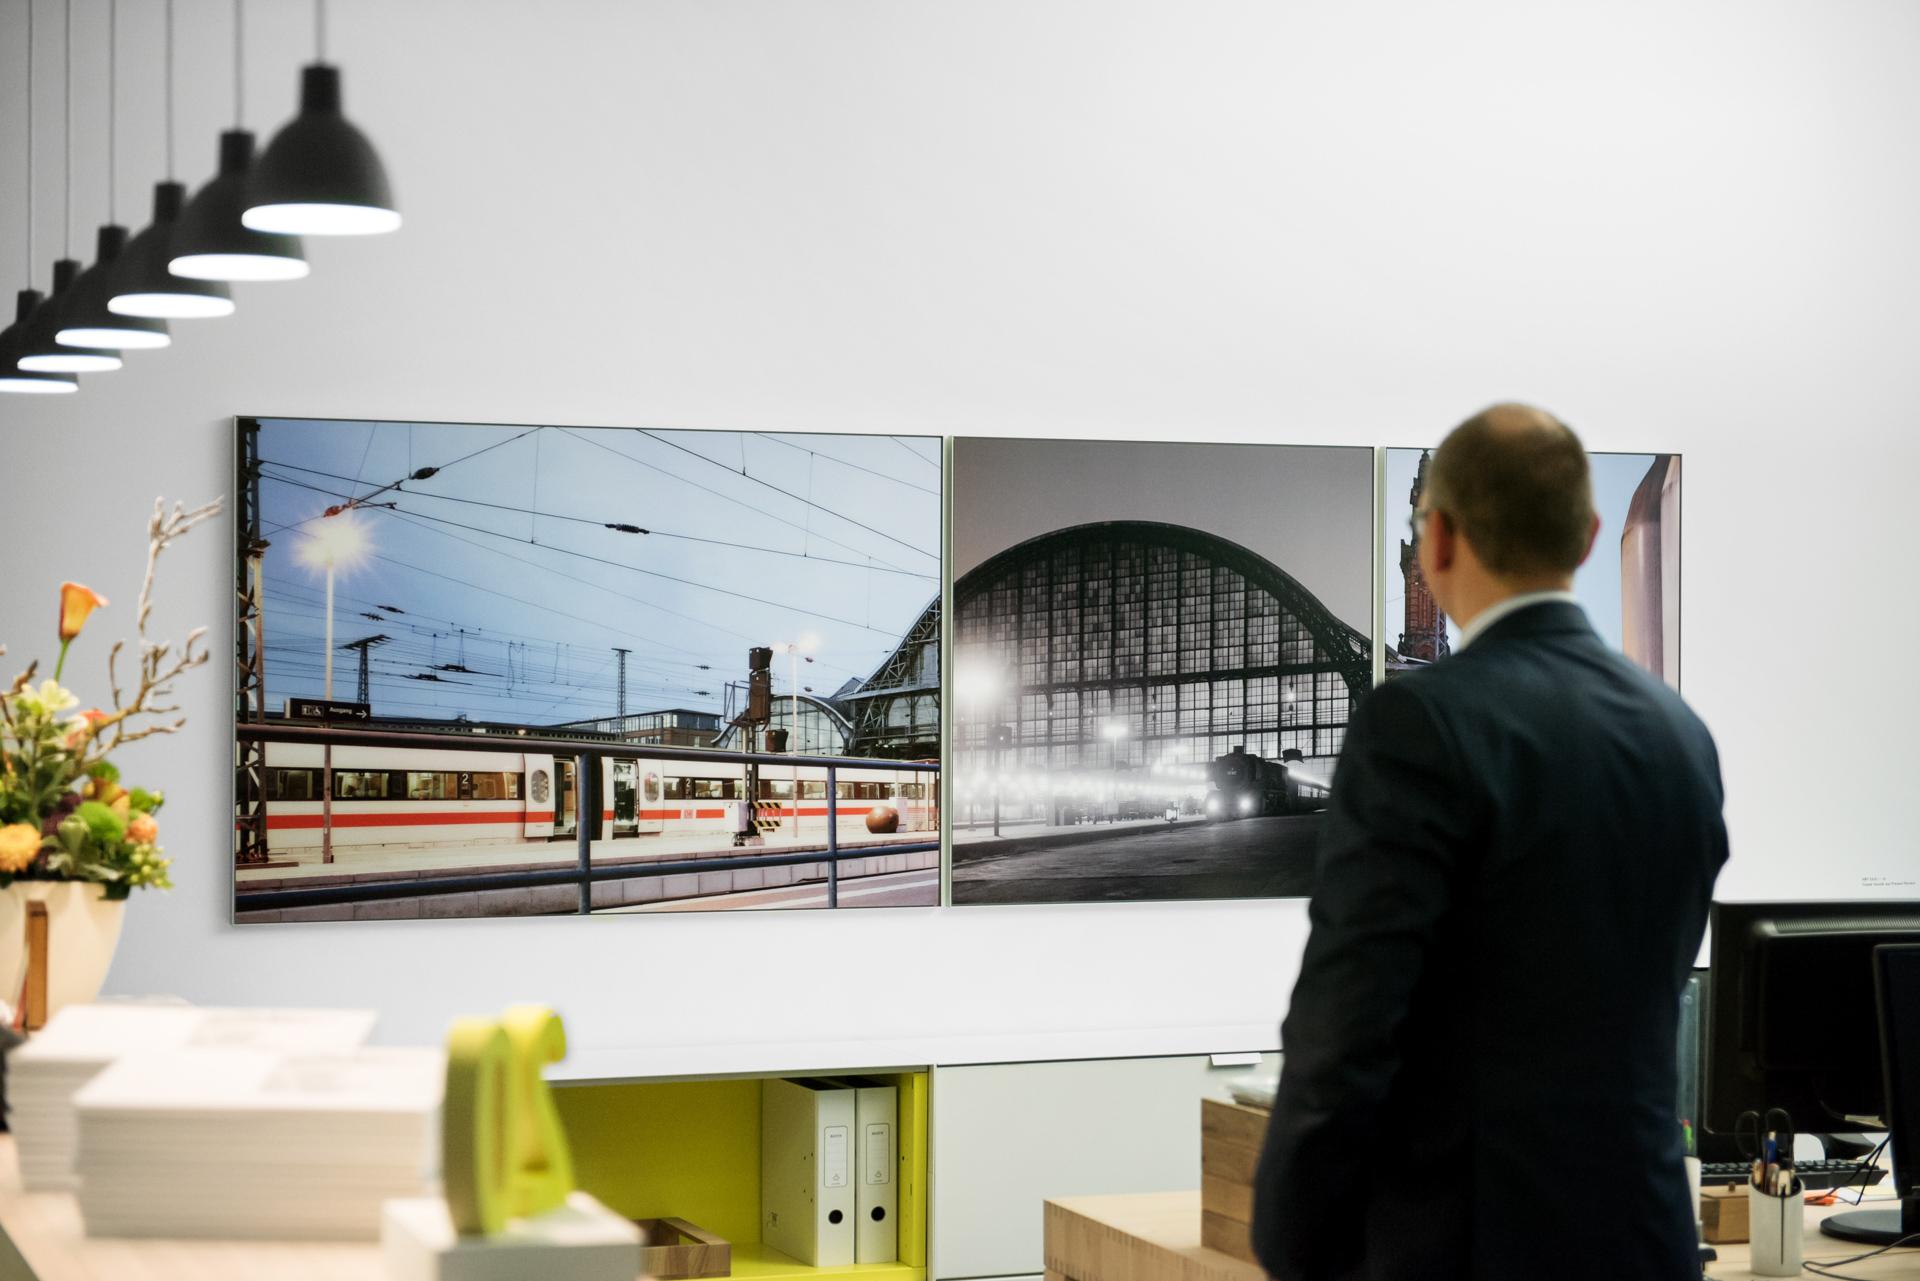 Caspar Sessler Arbeit »HBF 5615, I, II & III« in den Räumen der Bremer Kanzlei BBG + Partner